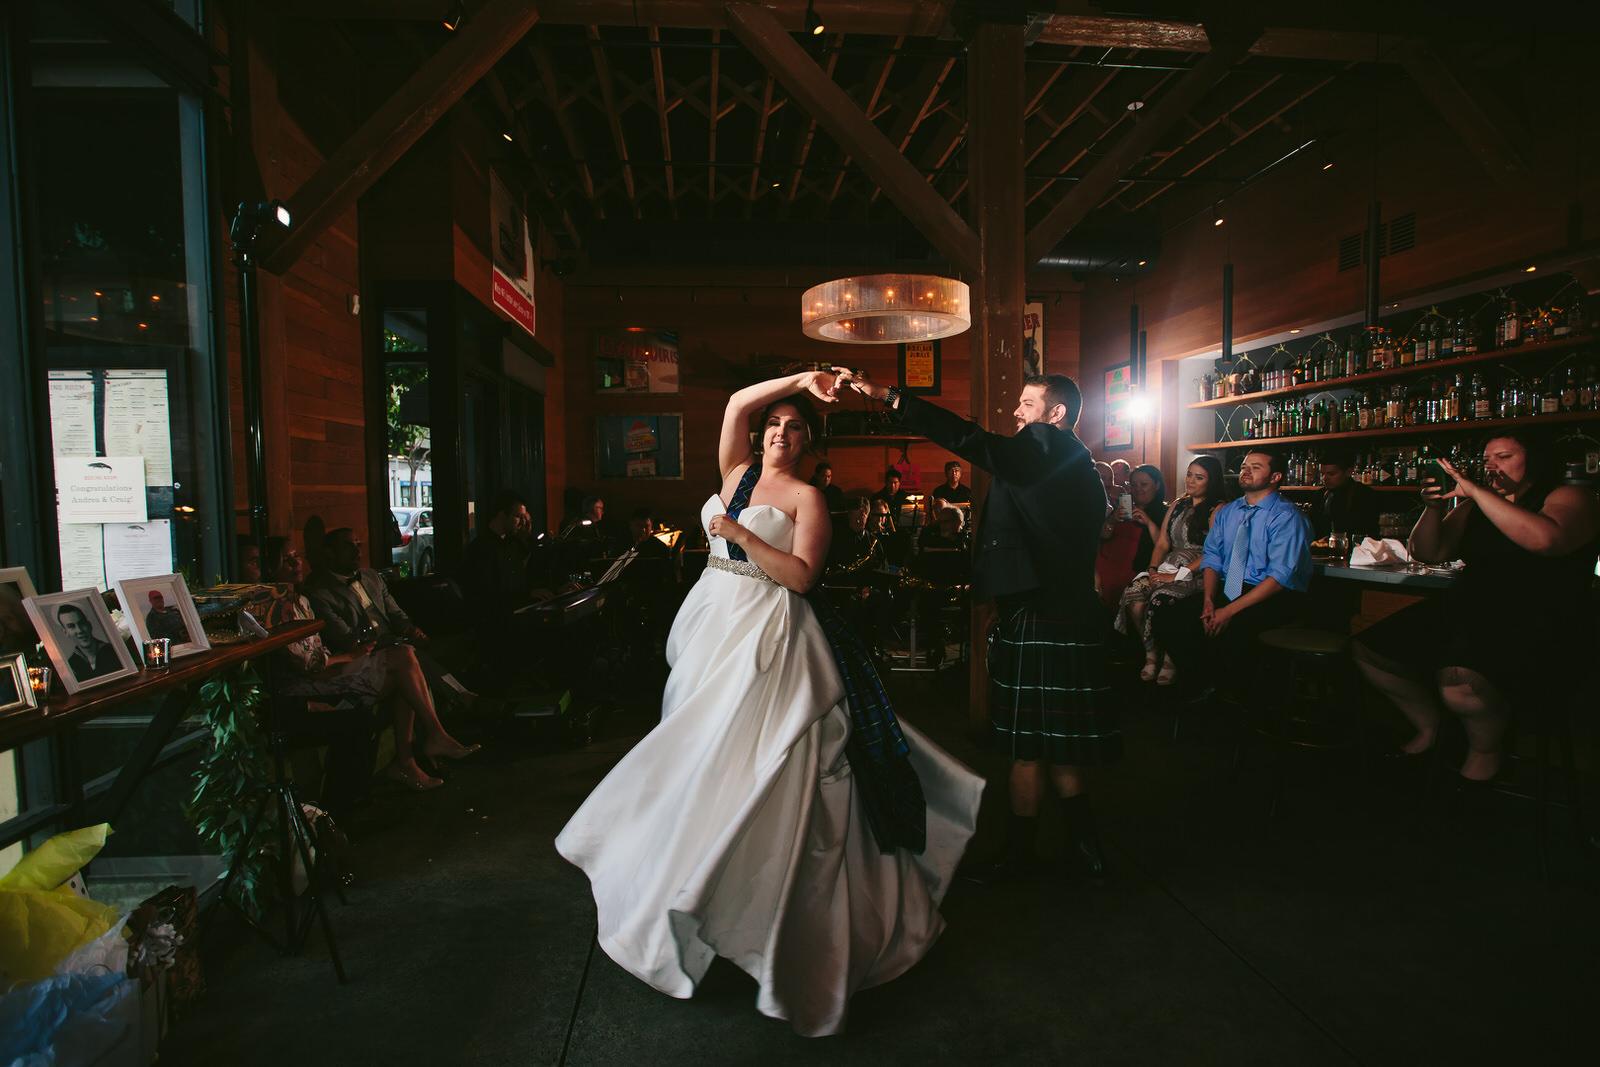 first_dance_bride_groom_intimate_wedding_photographer_san_francisco_bay_area.jpg